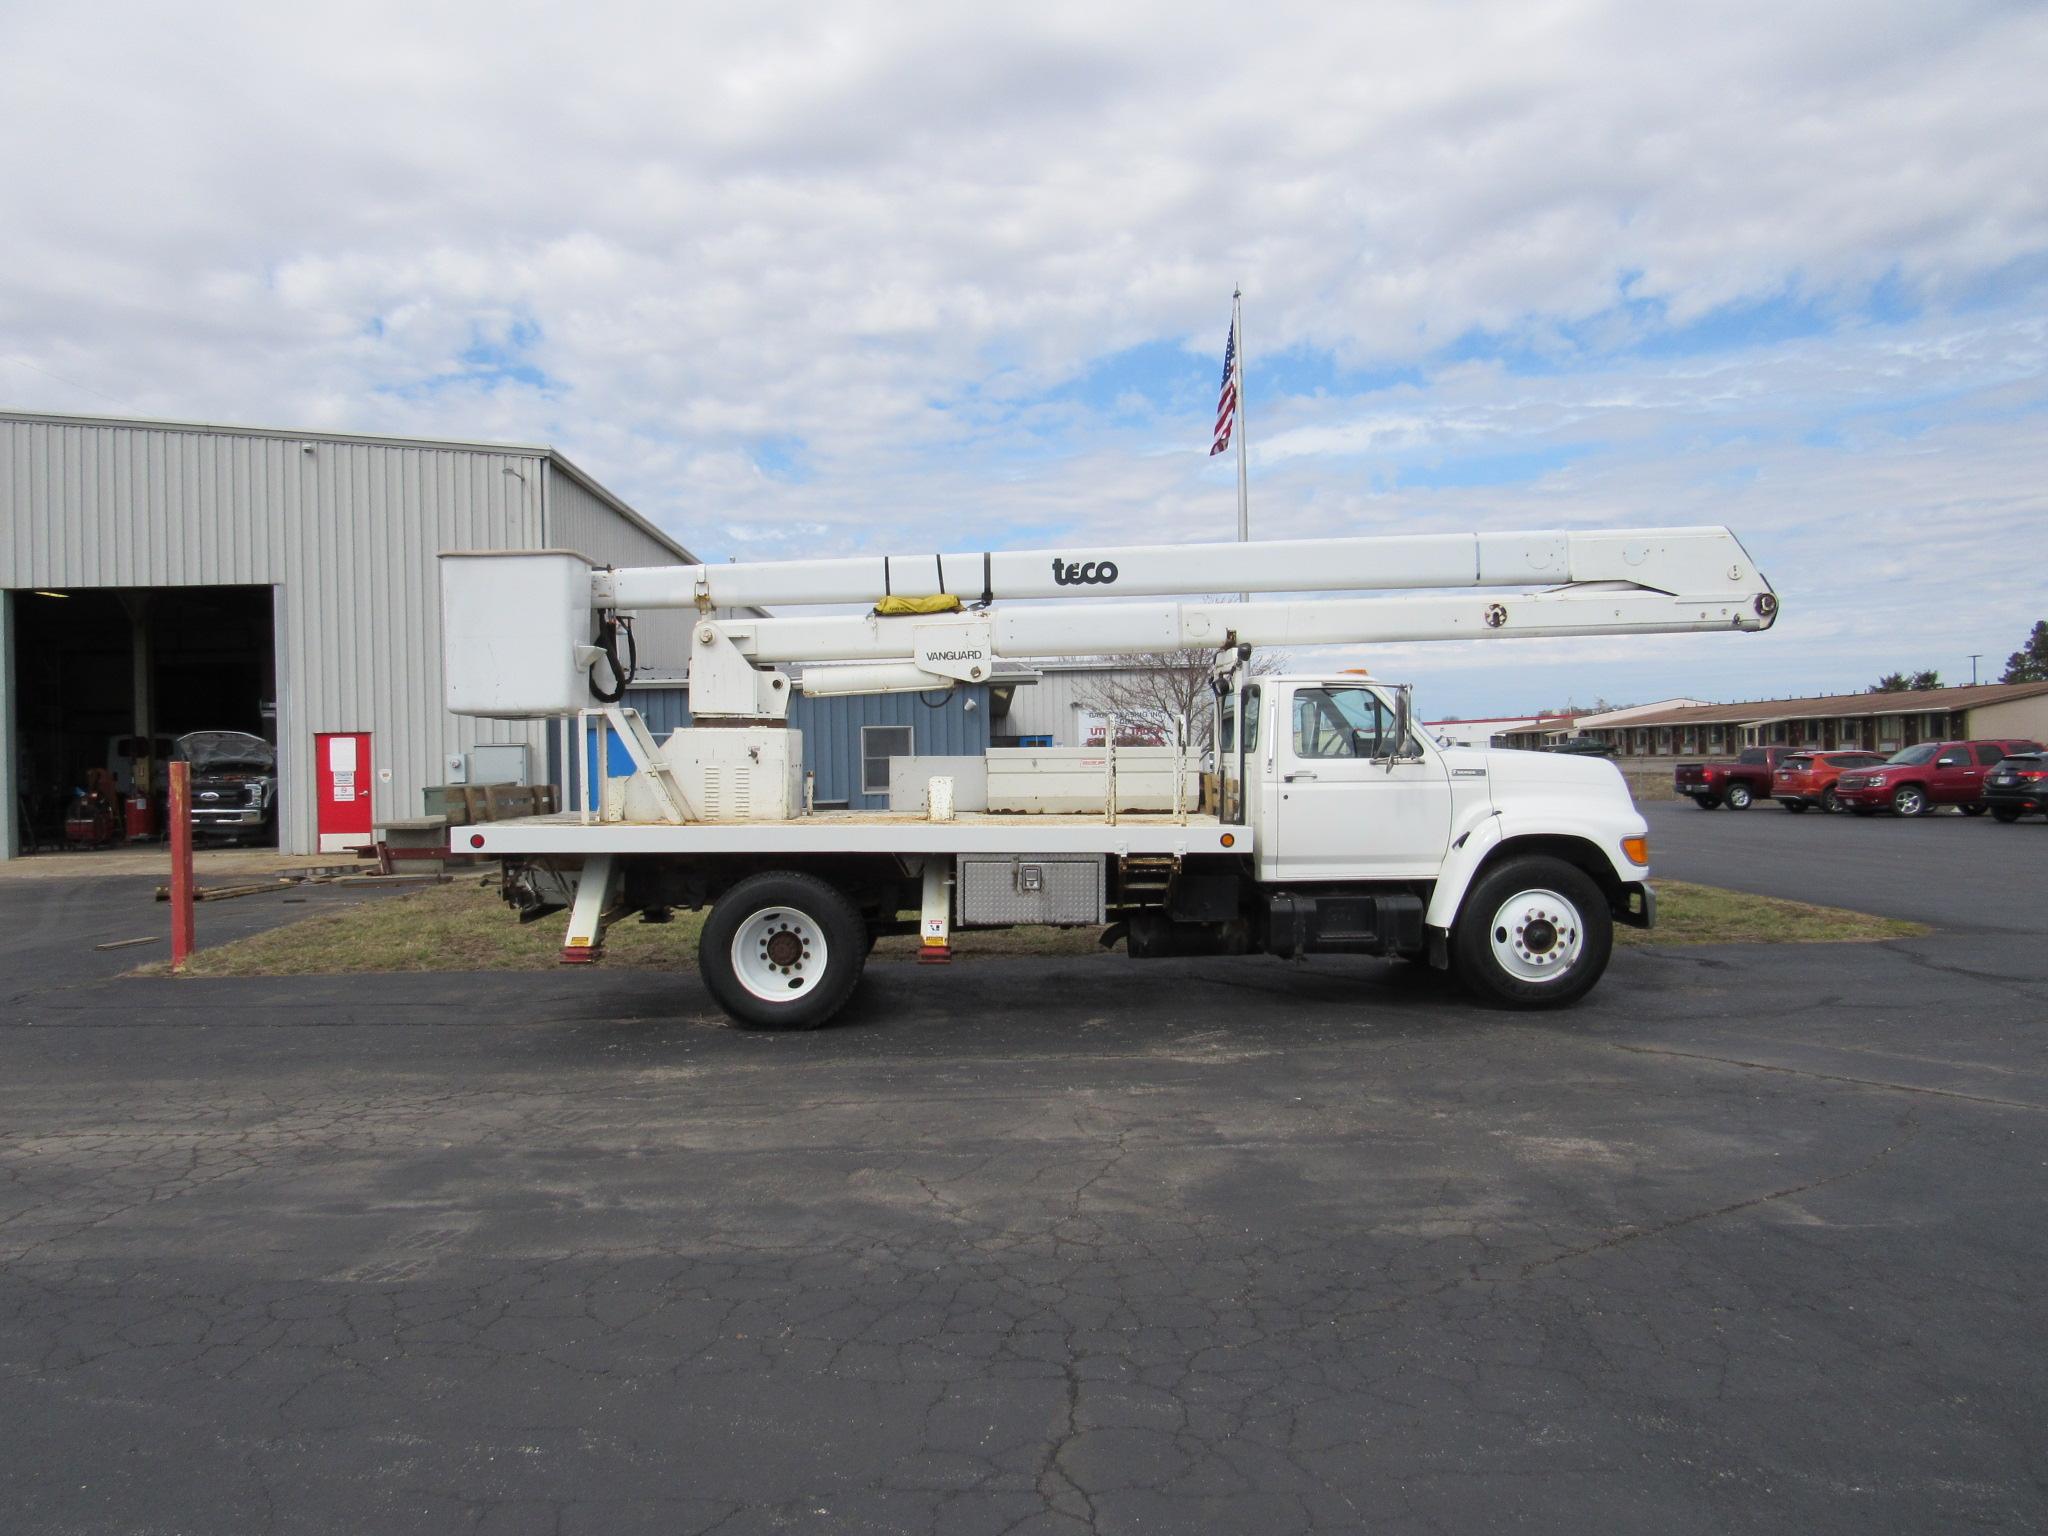 Used Bucket Trucks For Sale | Utility Truck Equipment Inc